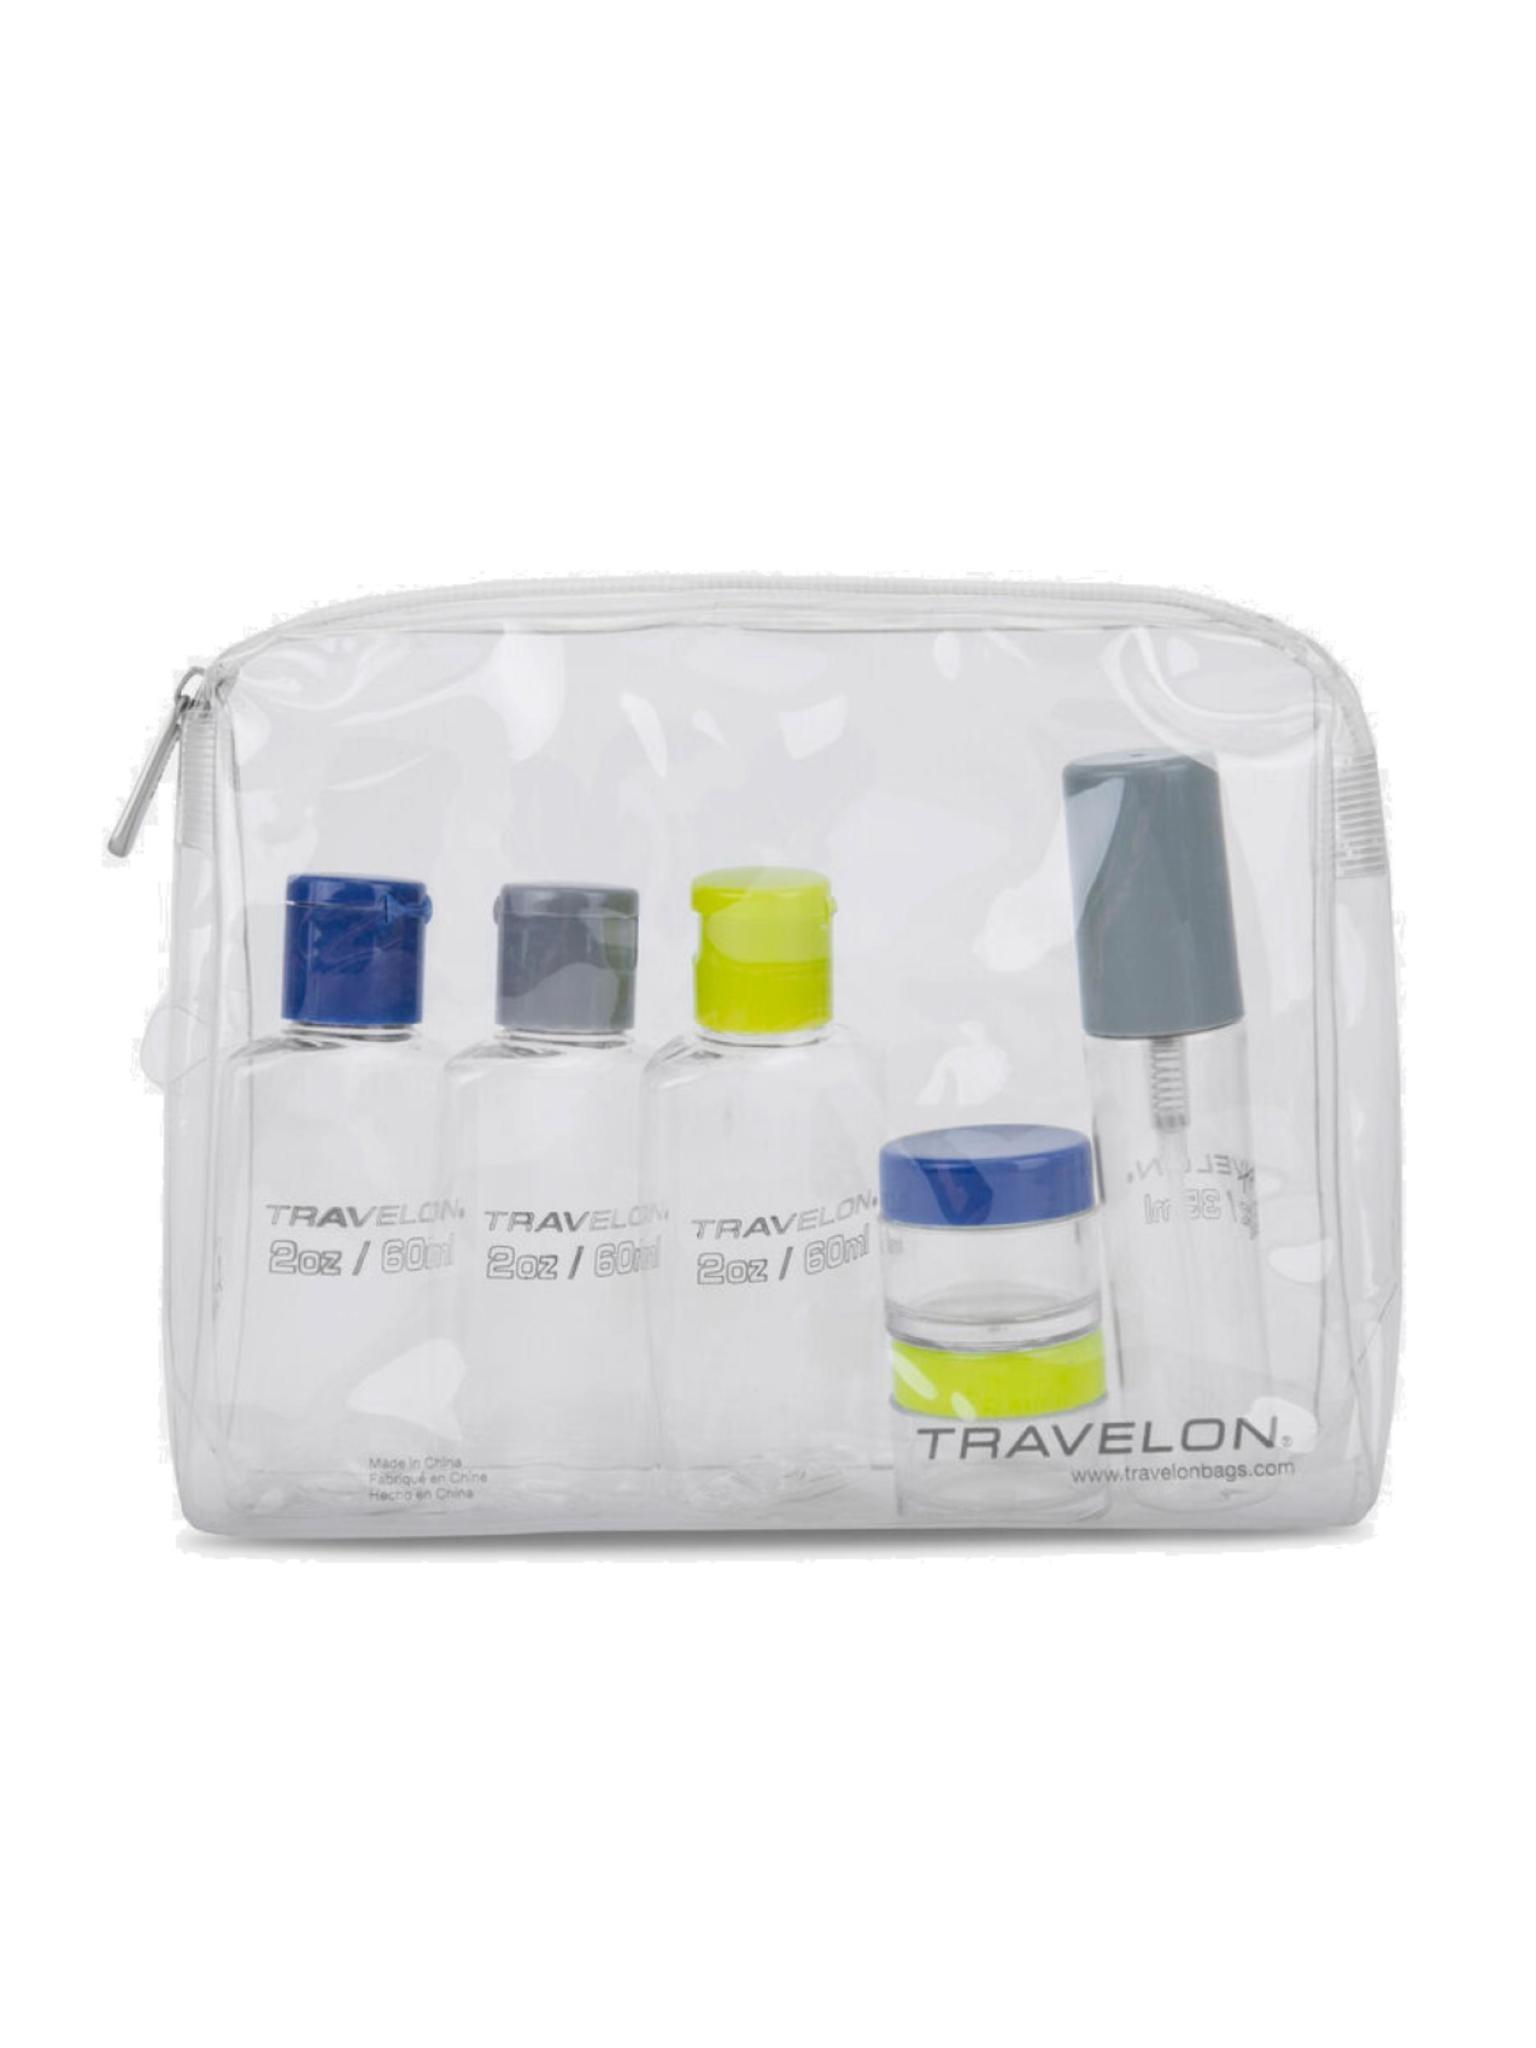 Travelon 1-Quart Zip-Top Bag with Bottles